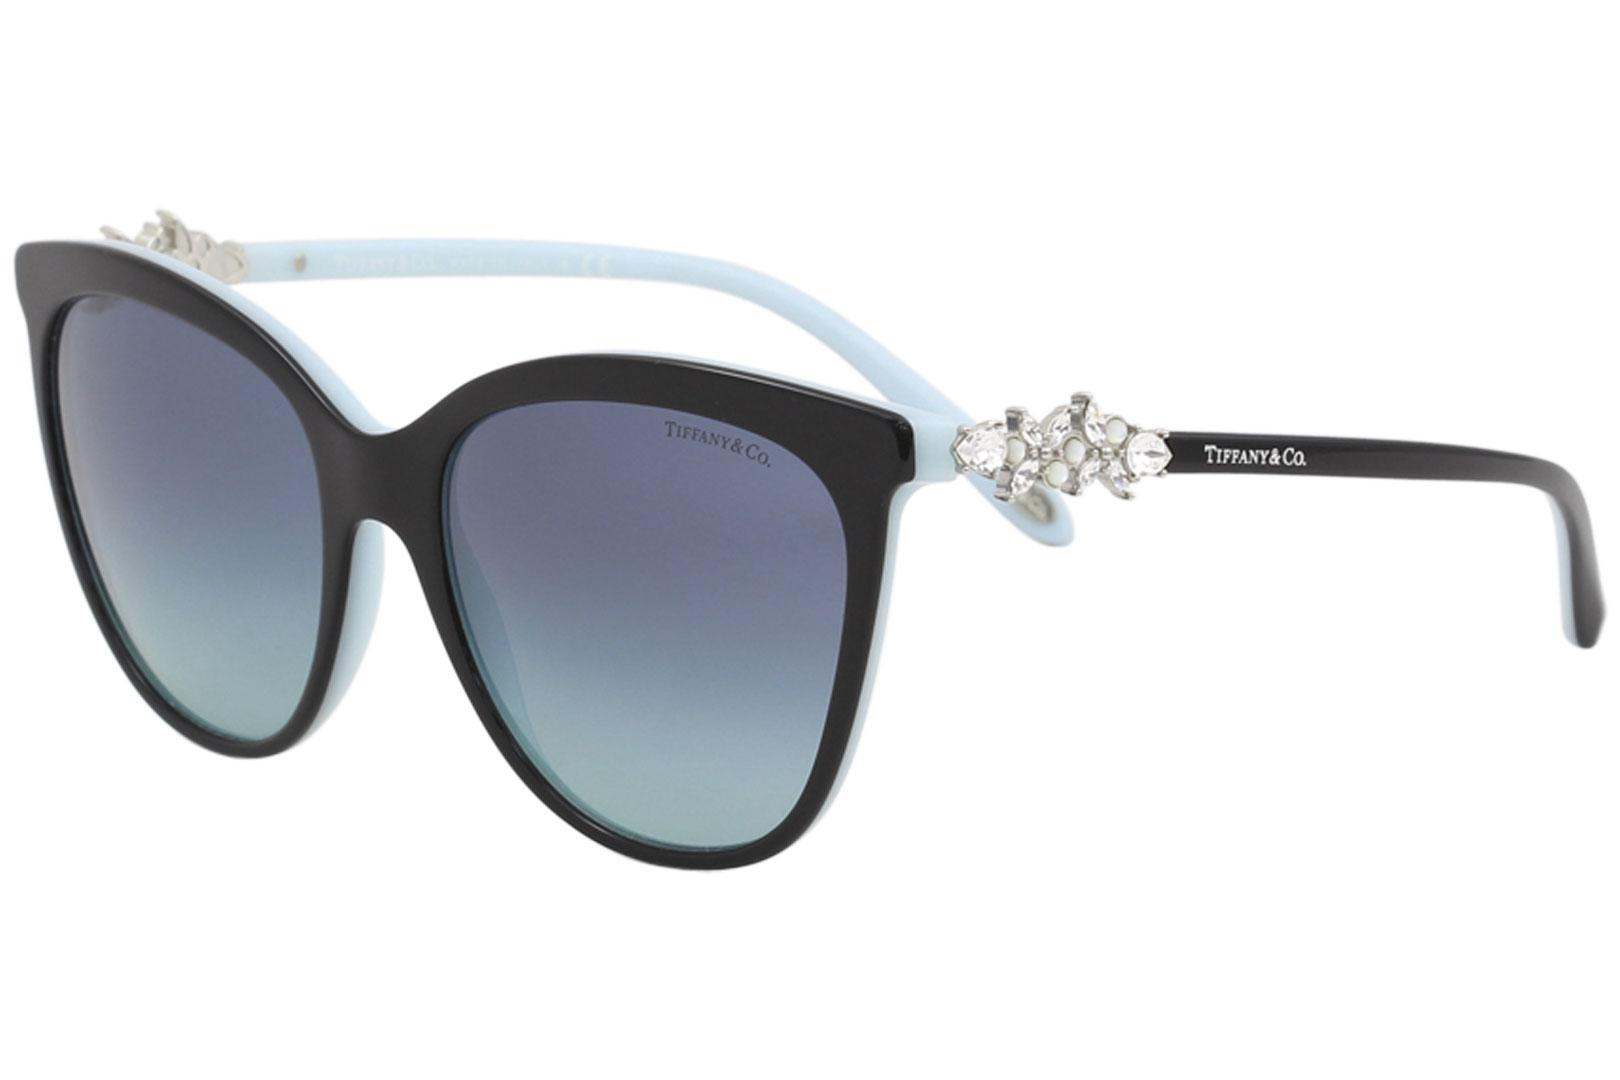 Tiffany Co Women S Tf4131 Tf 4131 Fashion Butterfly Sunglasses